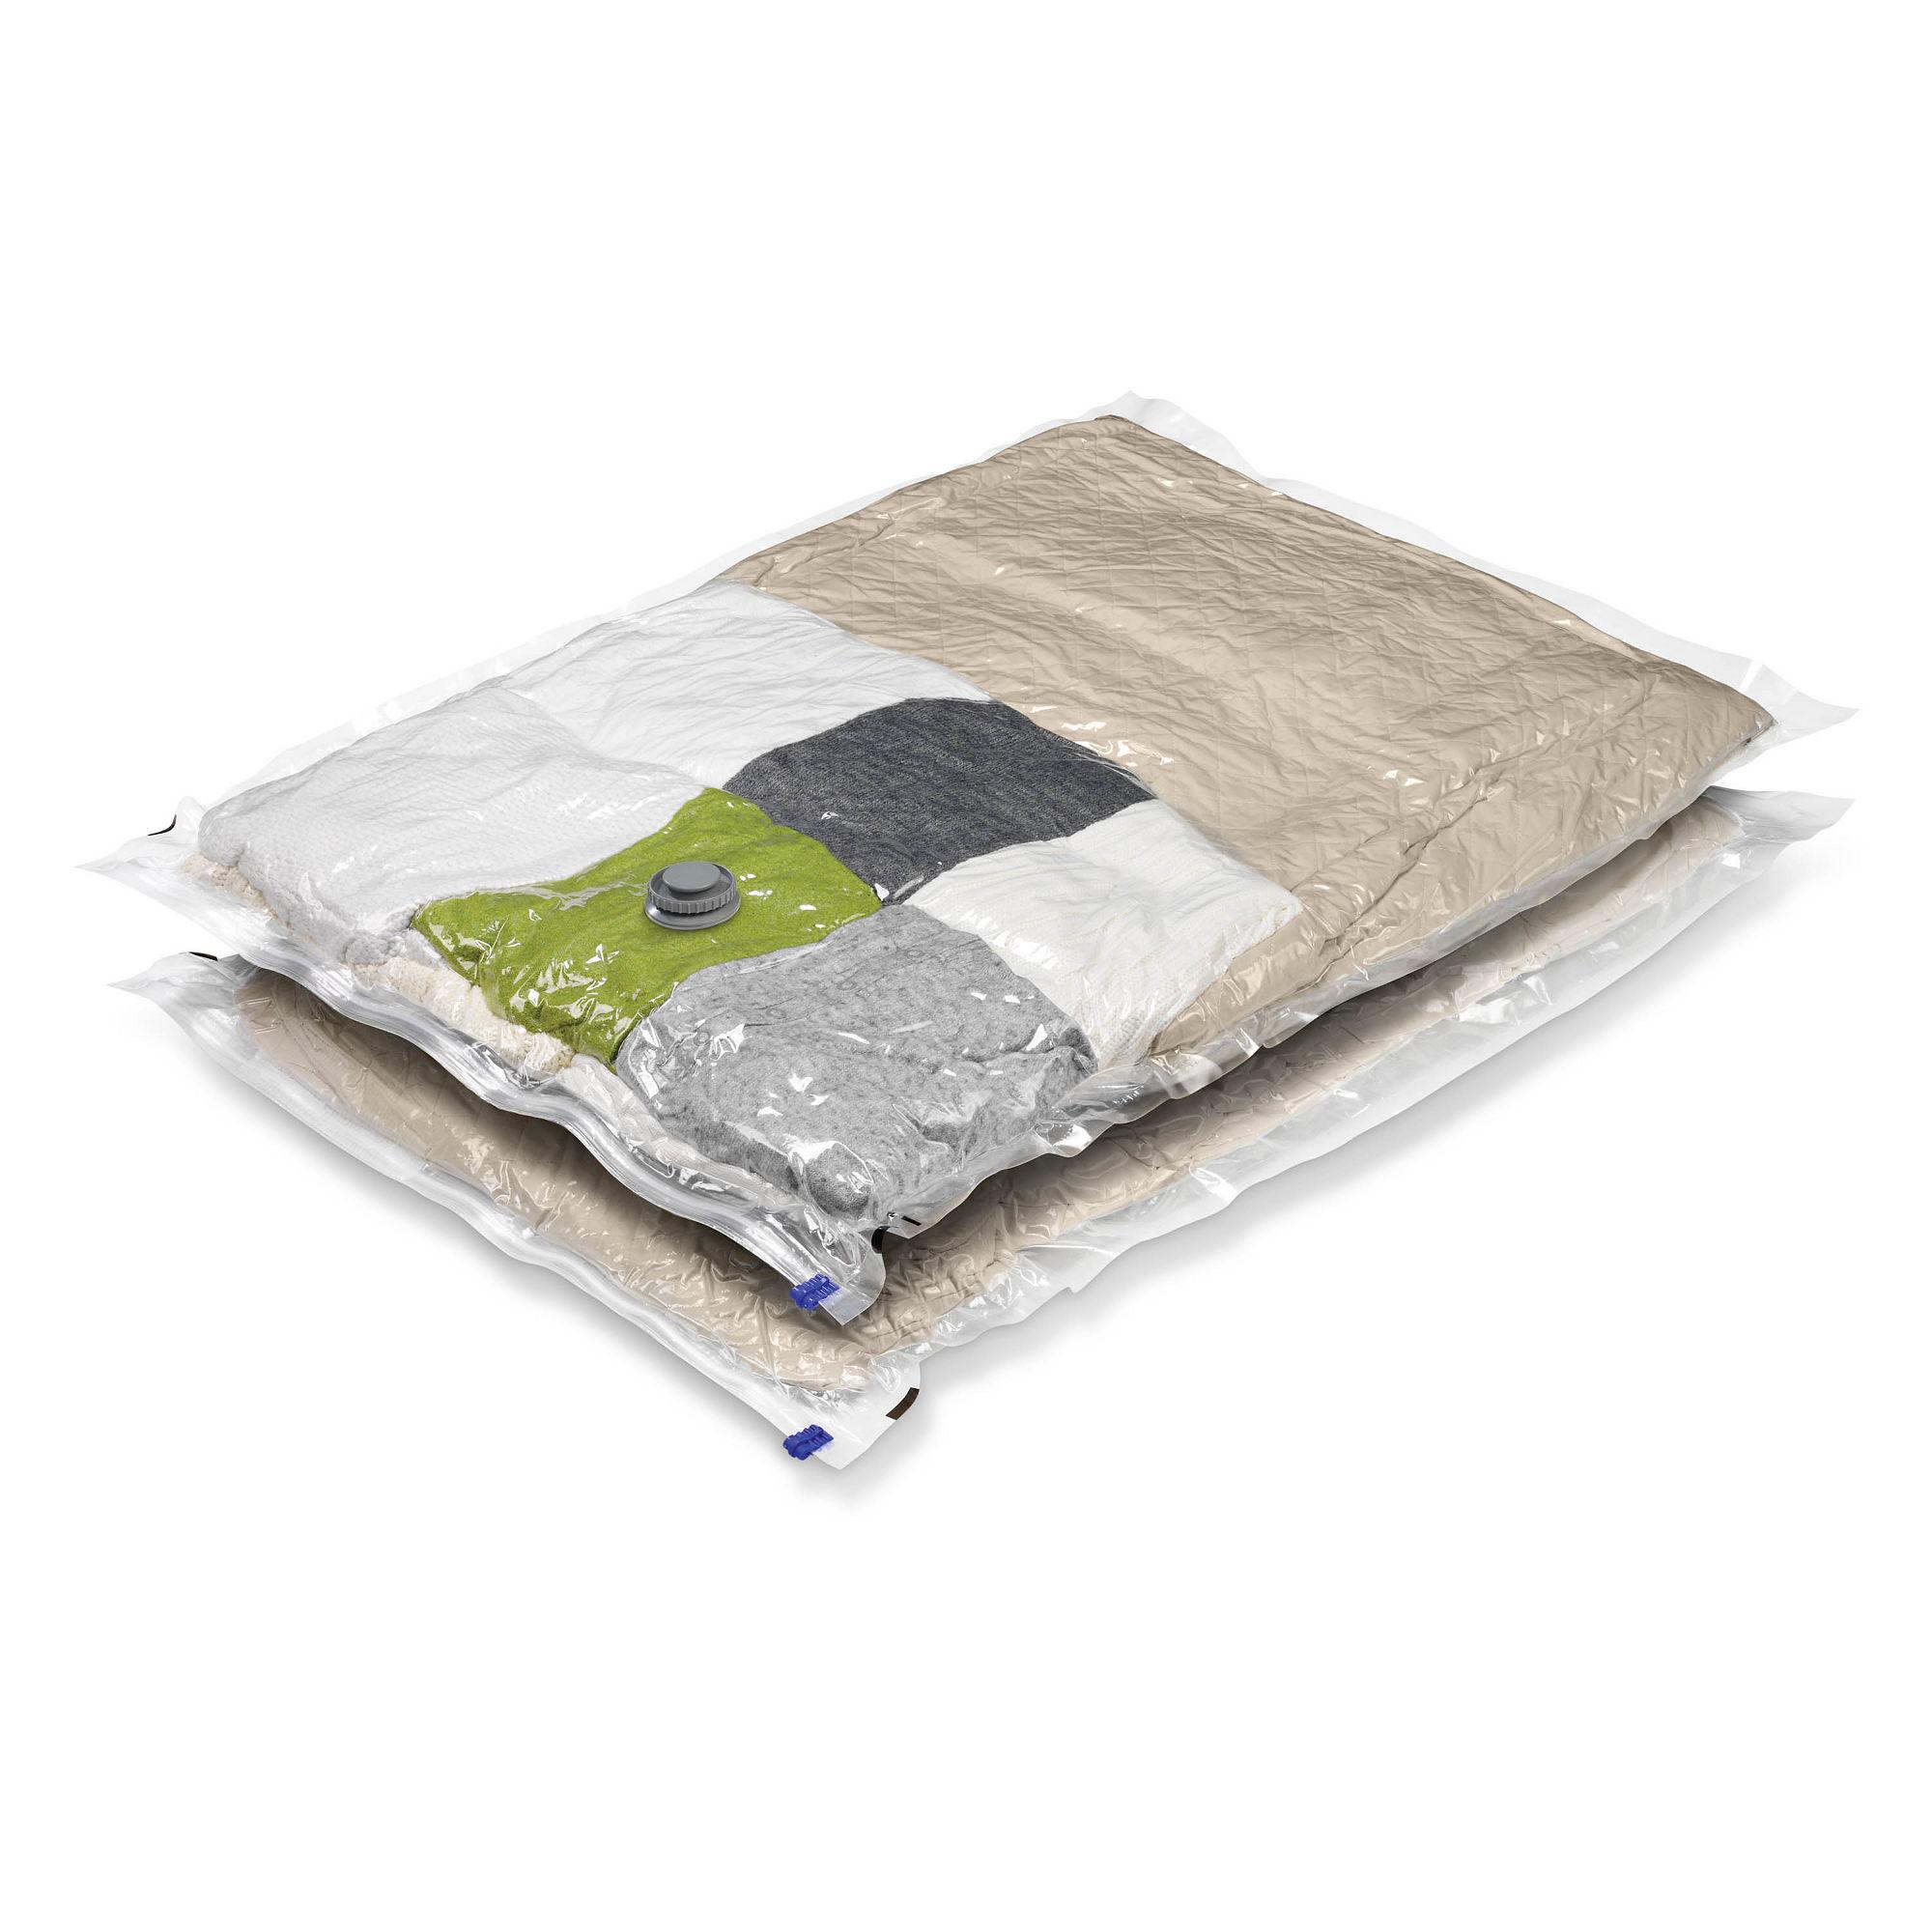 Honey-Can-Do 2-Pack Extra-Large Vacuum-Sealed Clothing Storage Bags